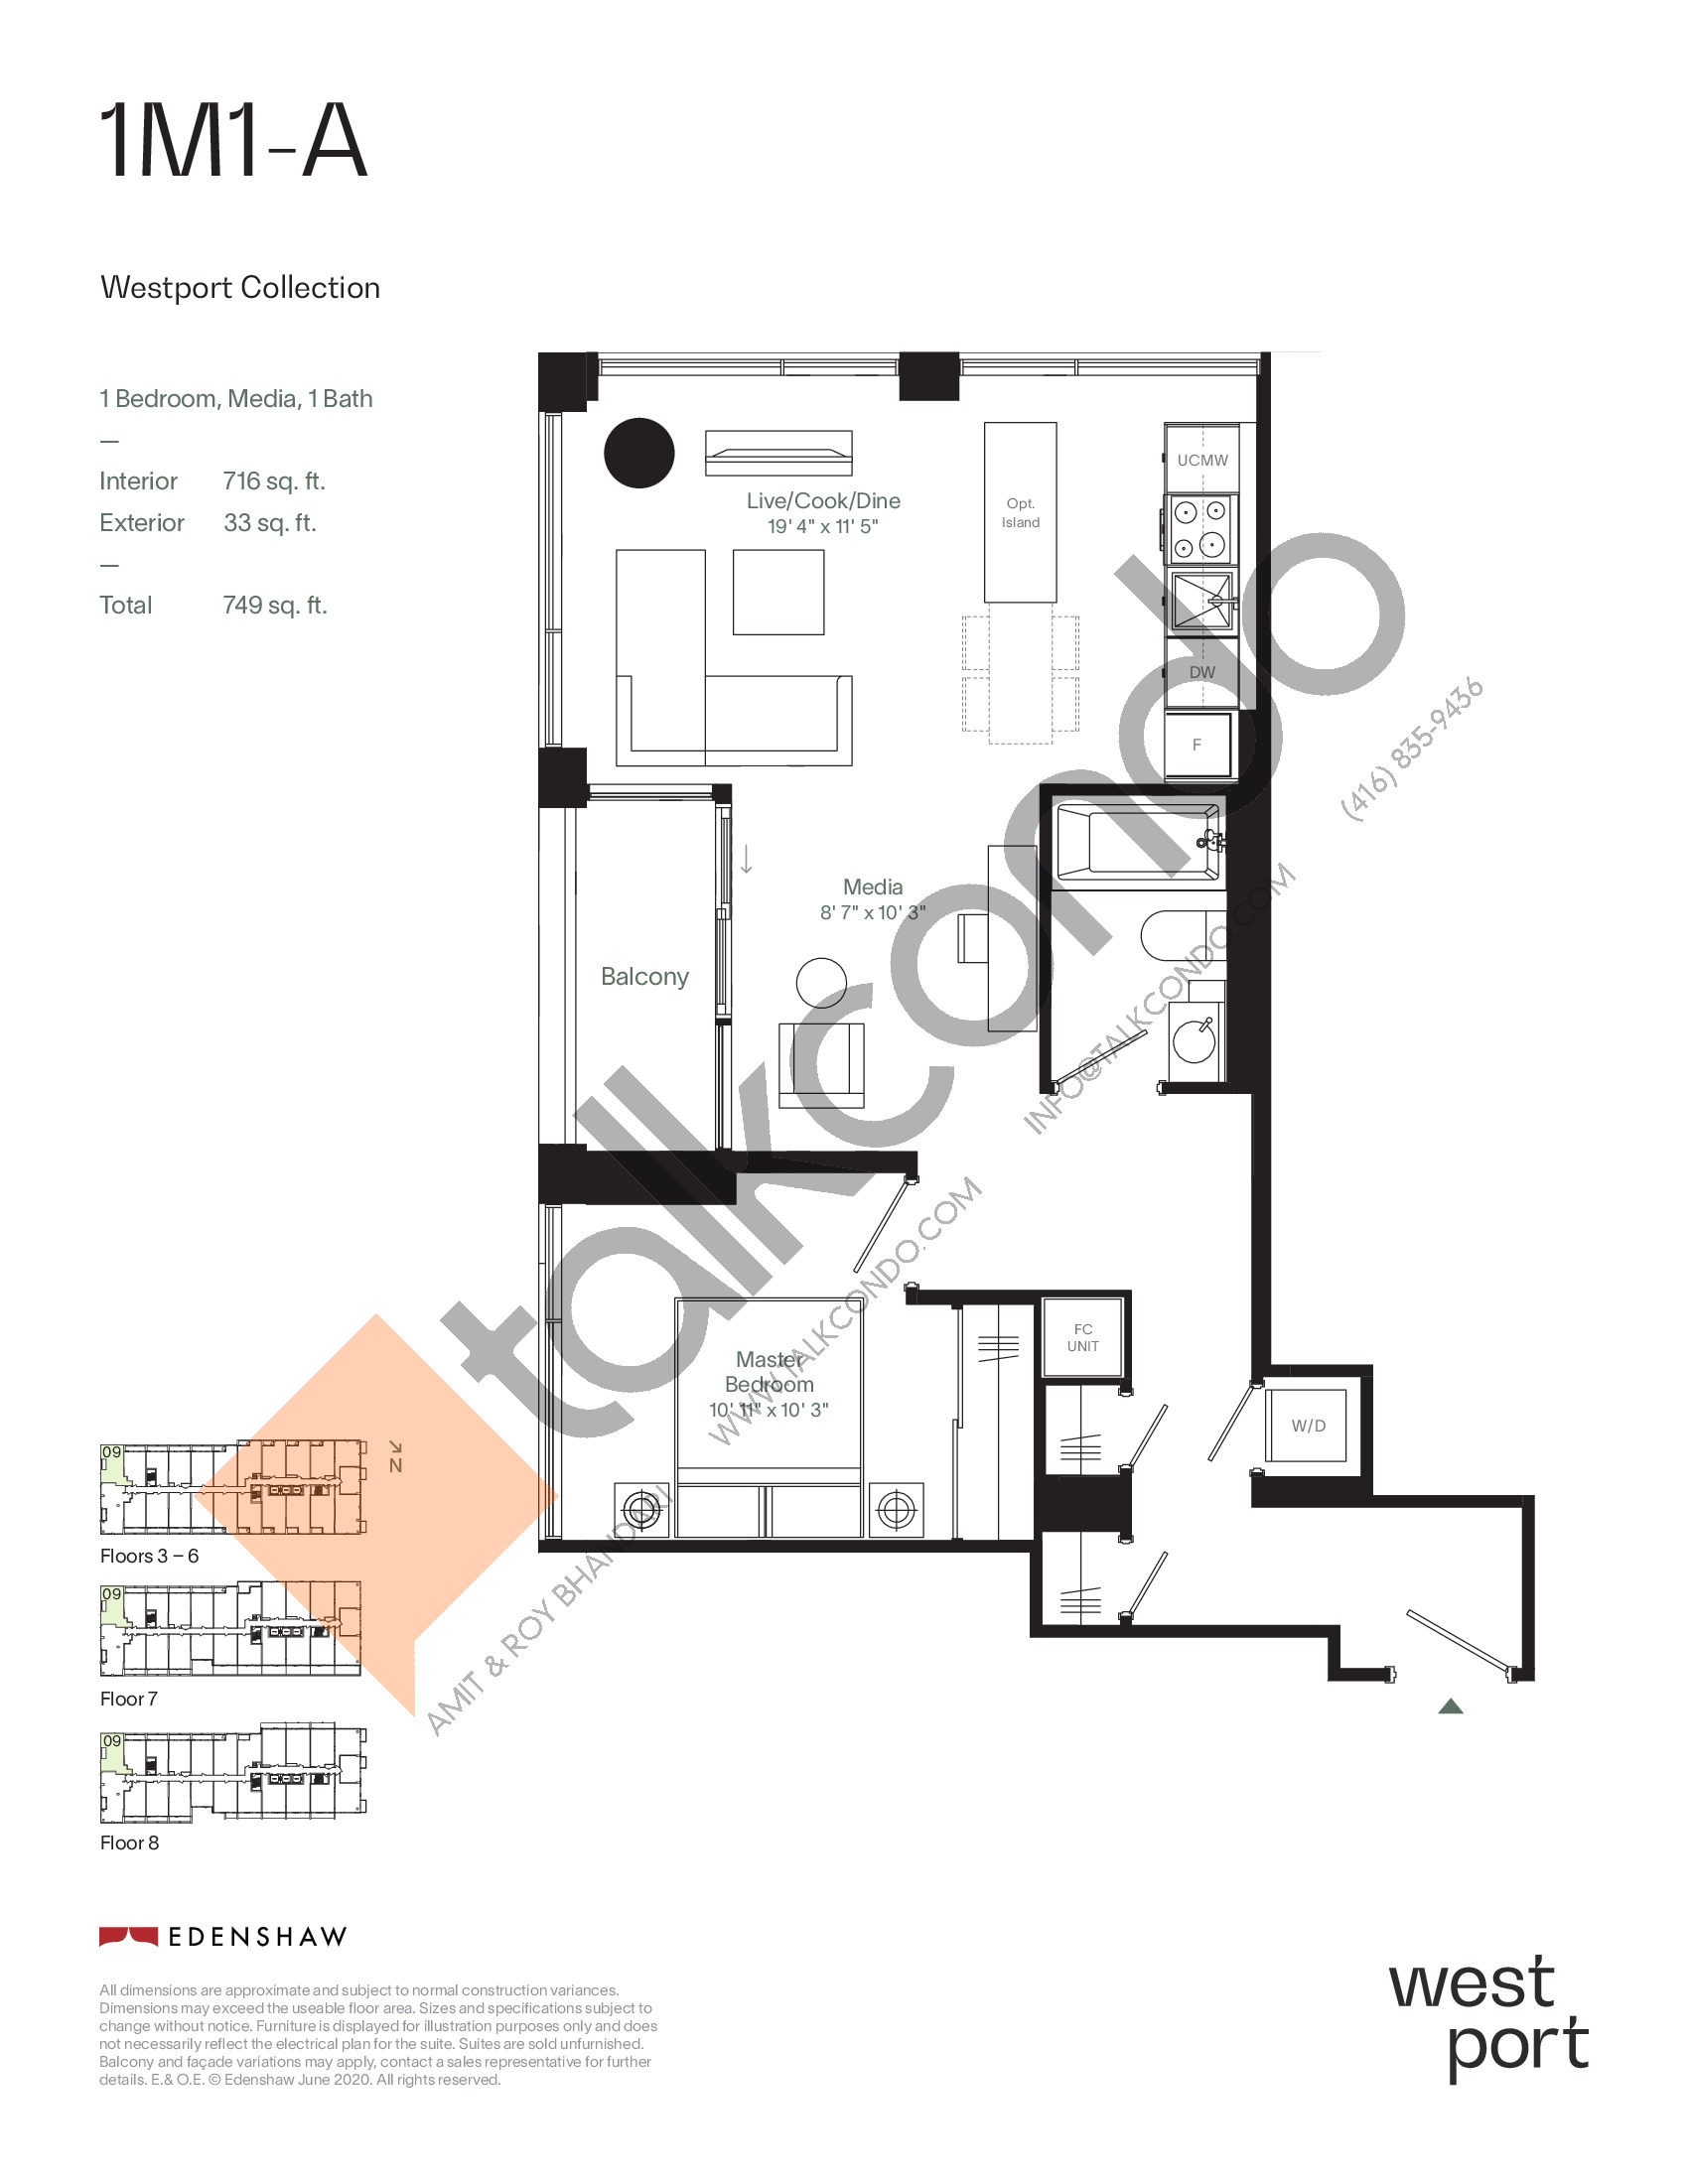 1M1-A - Westport Collection Floor Plan at Westport Condos - 716 sq.ft